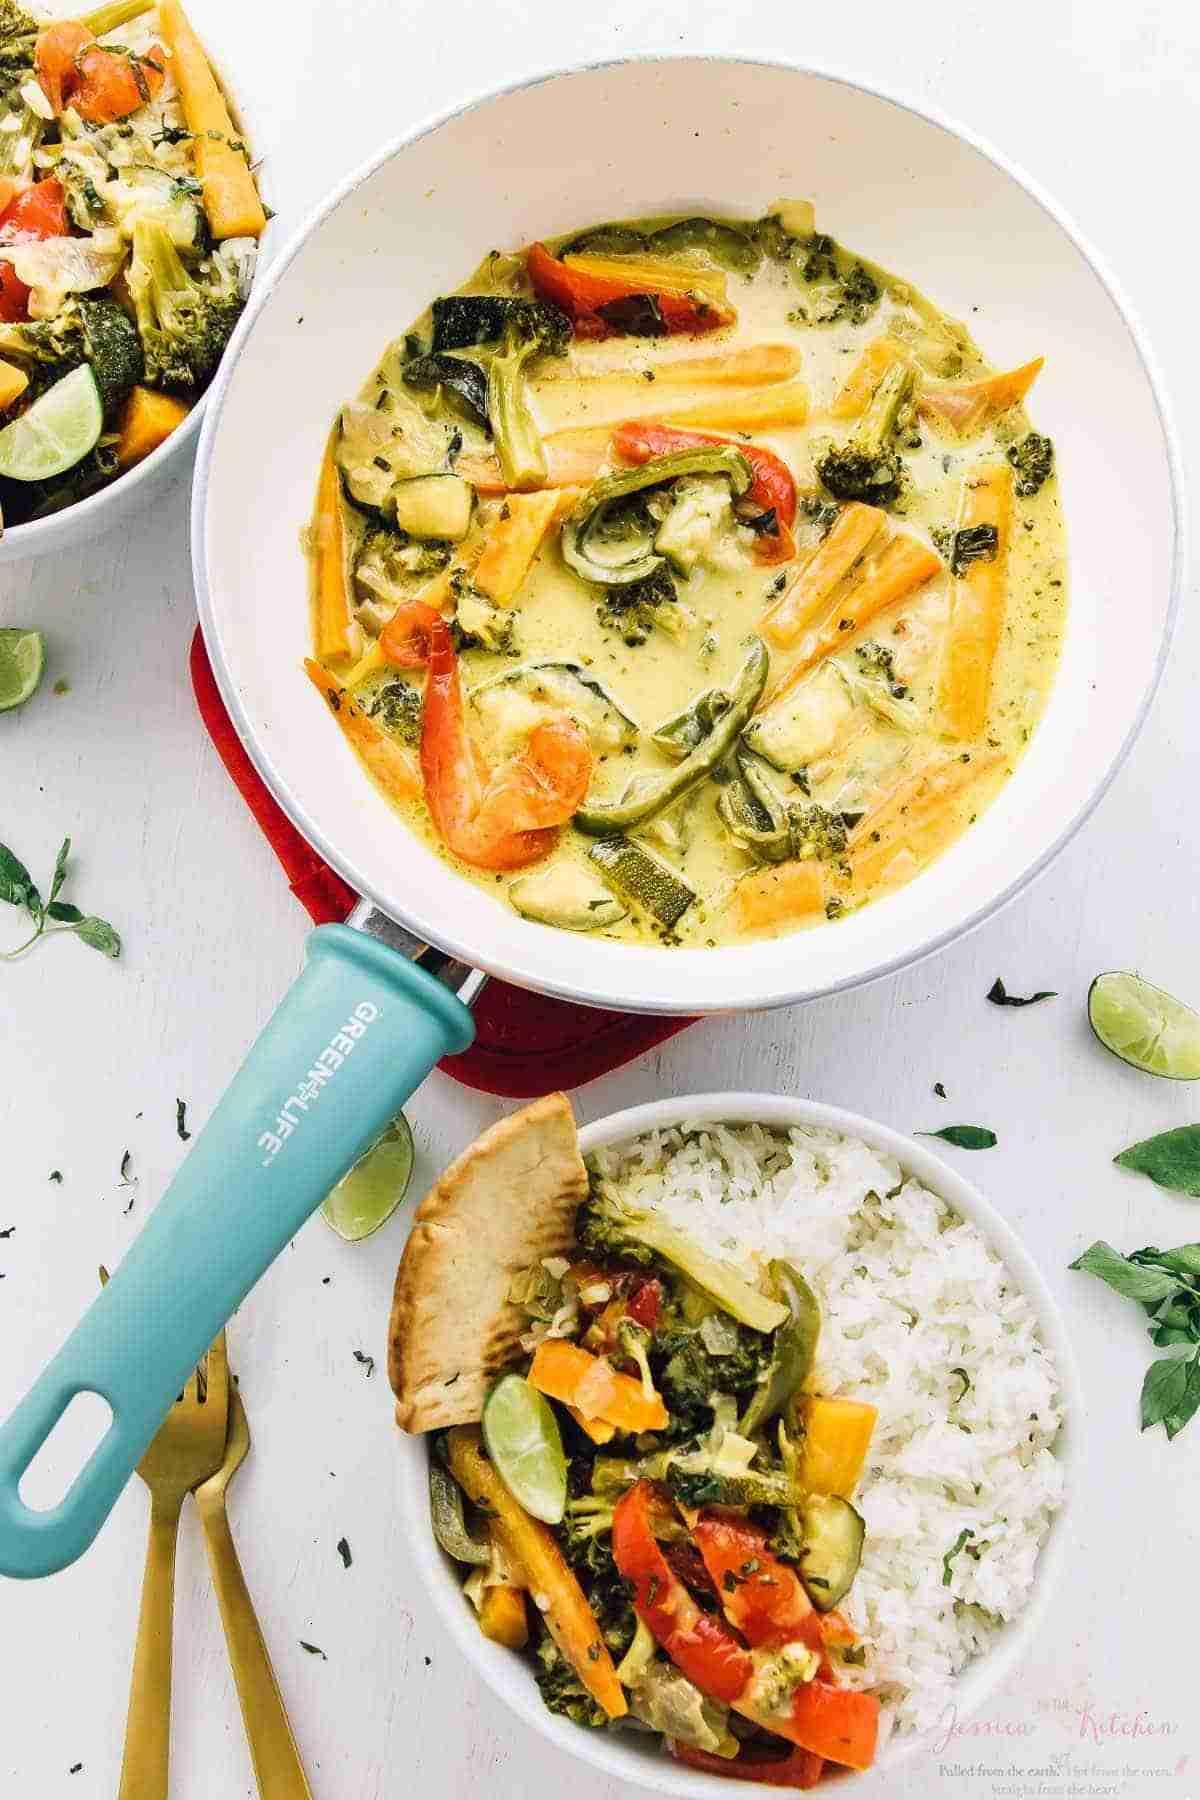 Thai Green Curry Recipe (15 Minutes Prep, Vegan & Gluten Free)